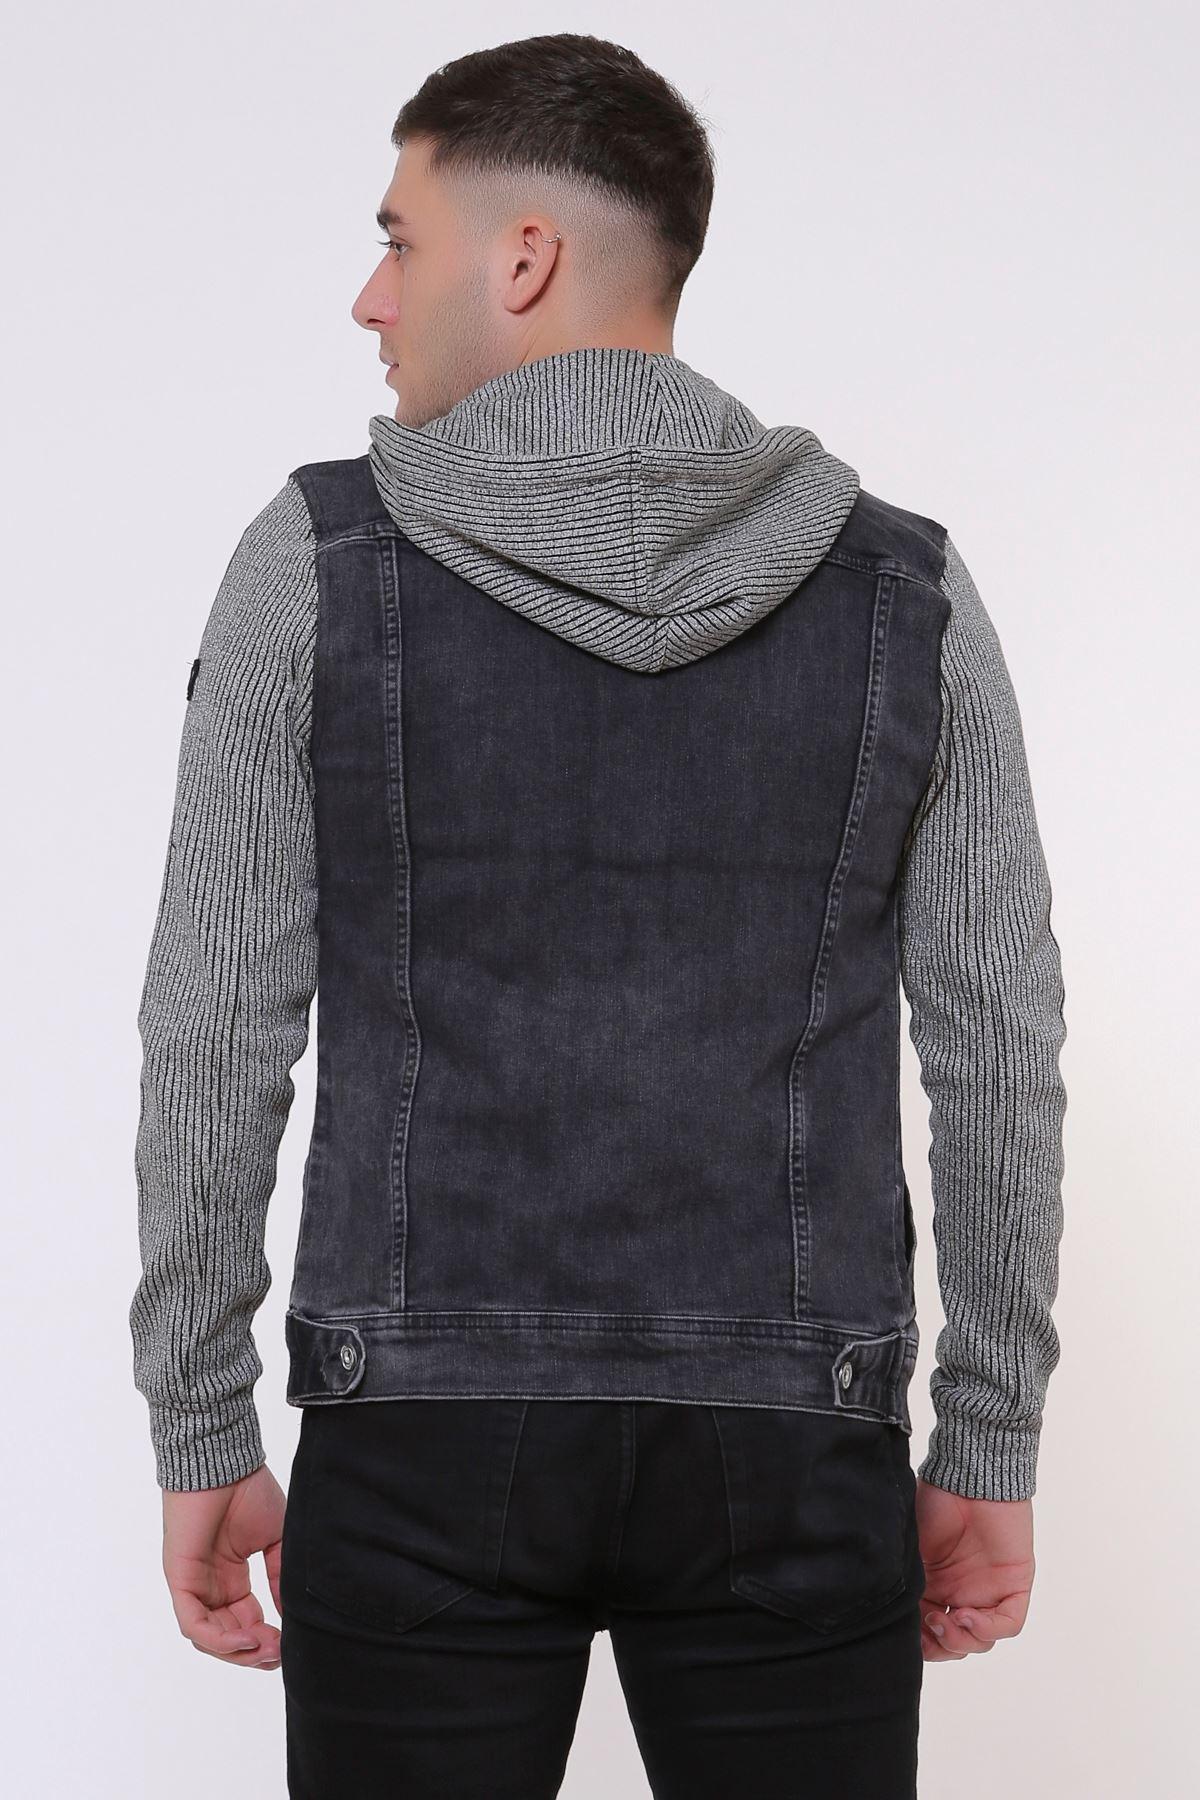 Kapüşonlu Kolu Şerit Detay Erkek Füme Kot Ceket